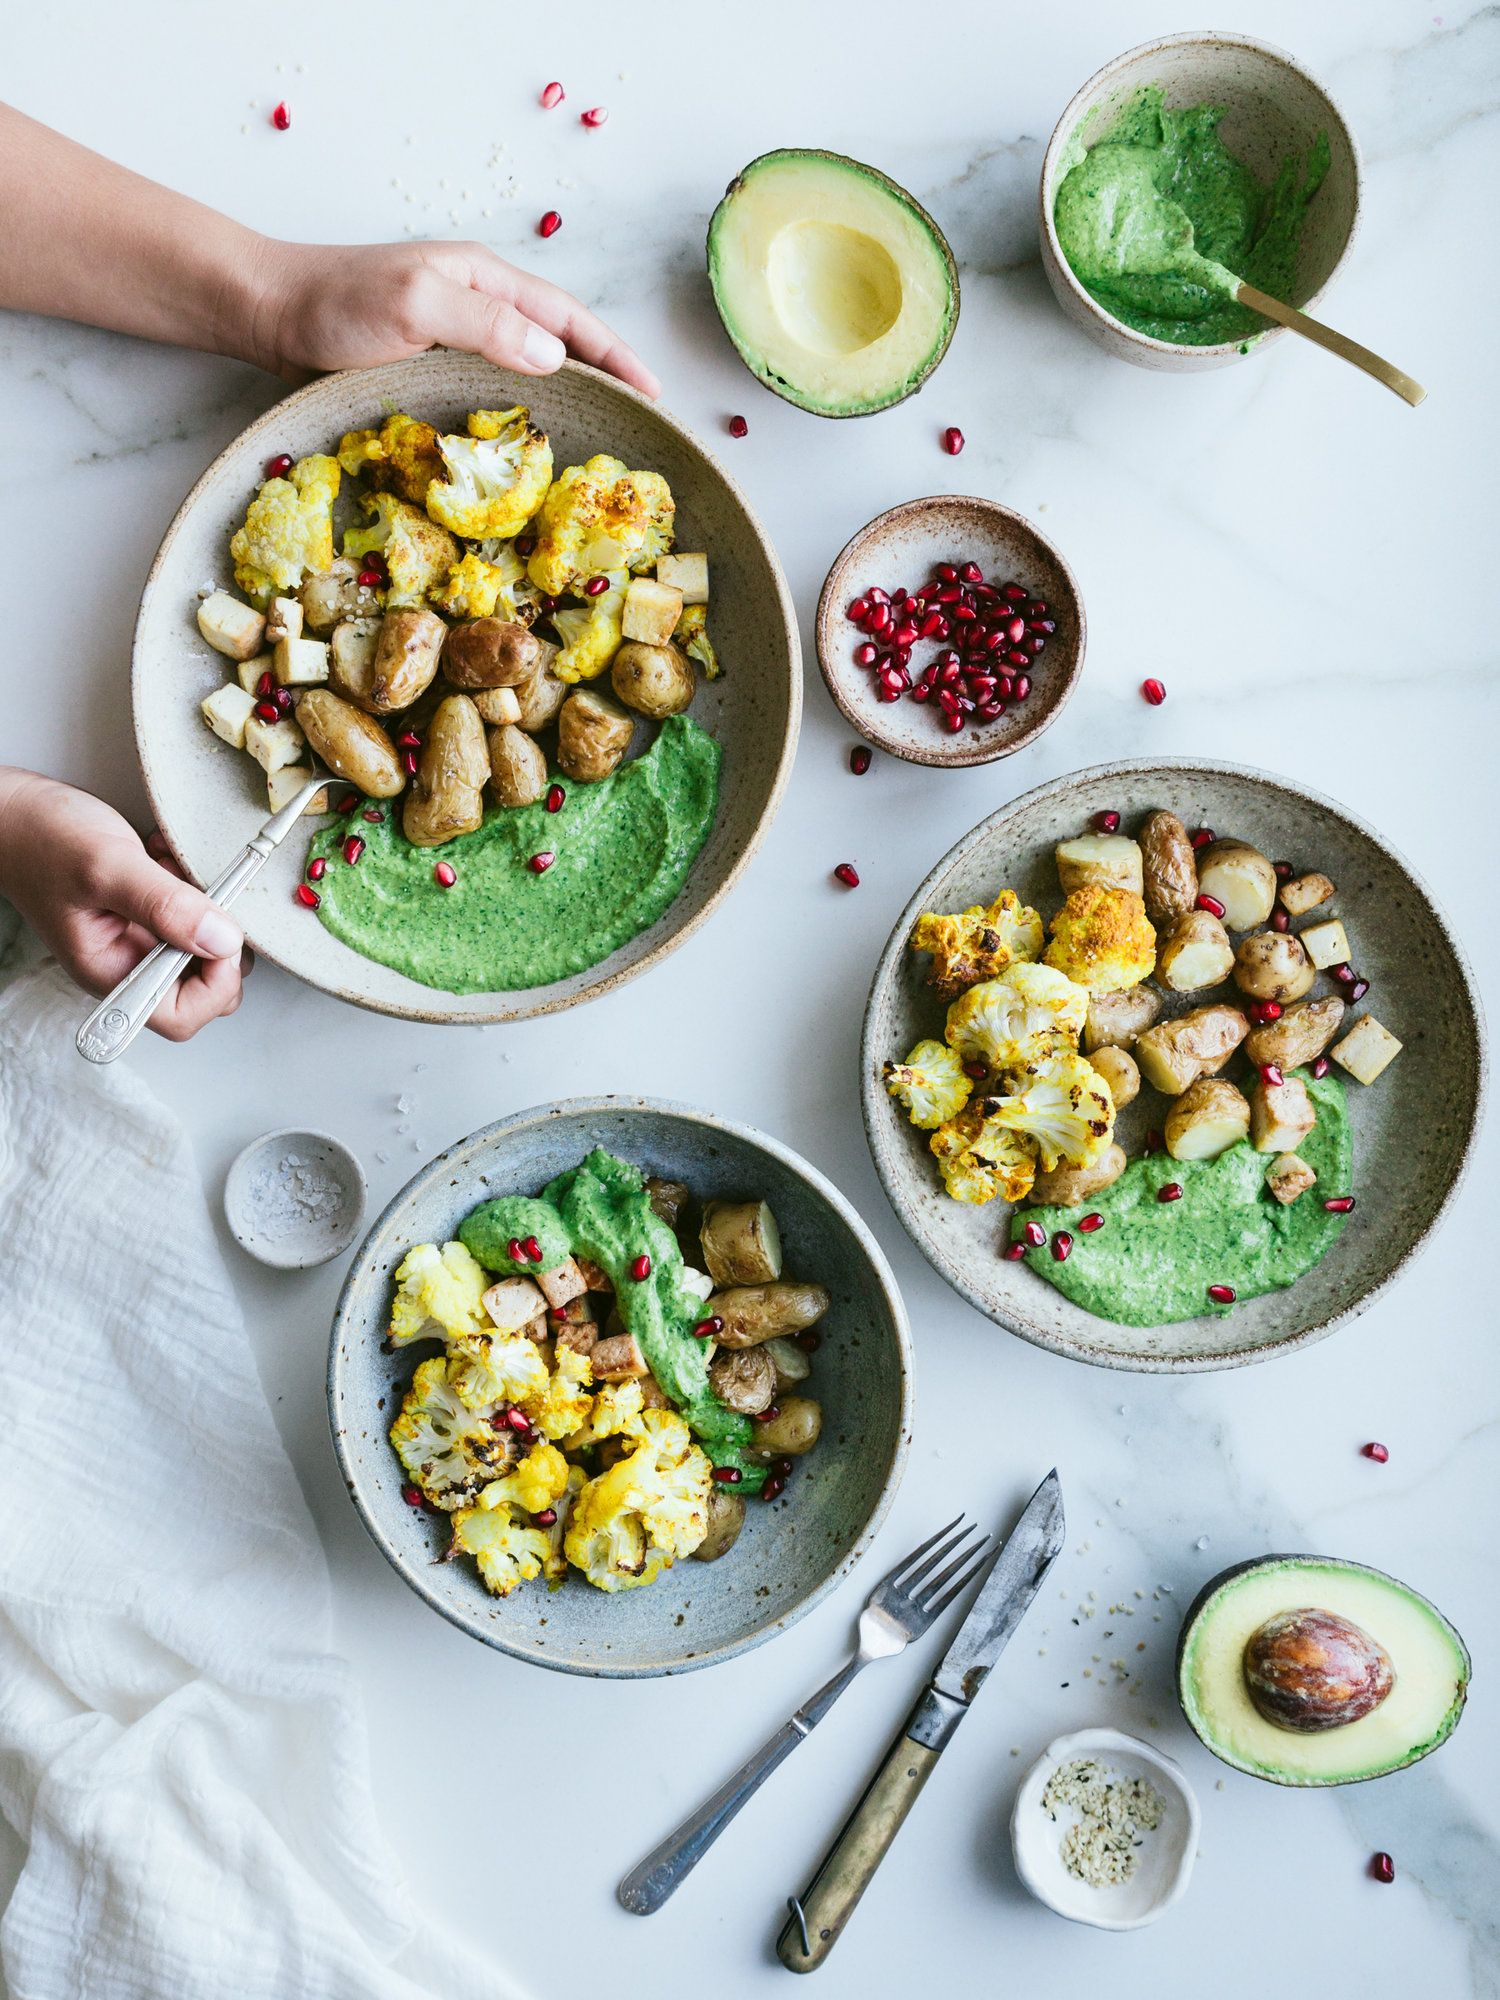 Vegan Green Goddess Sauce Recipe In Collaboration With Gem